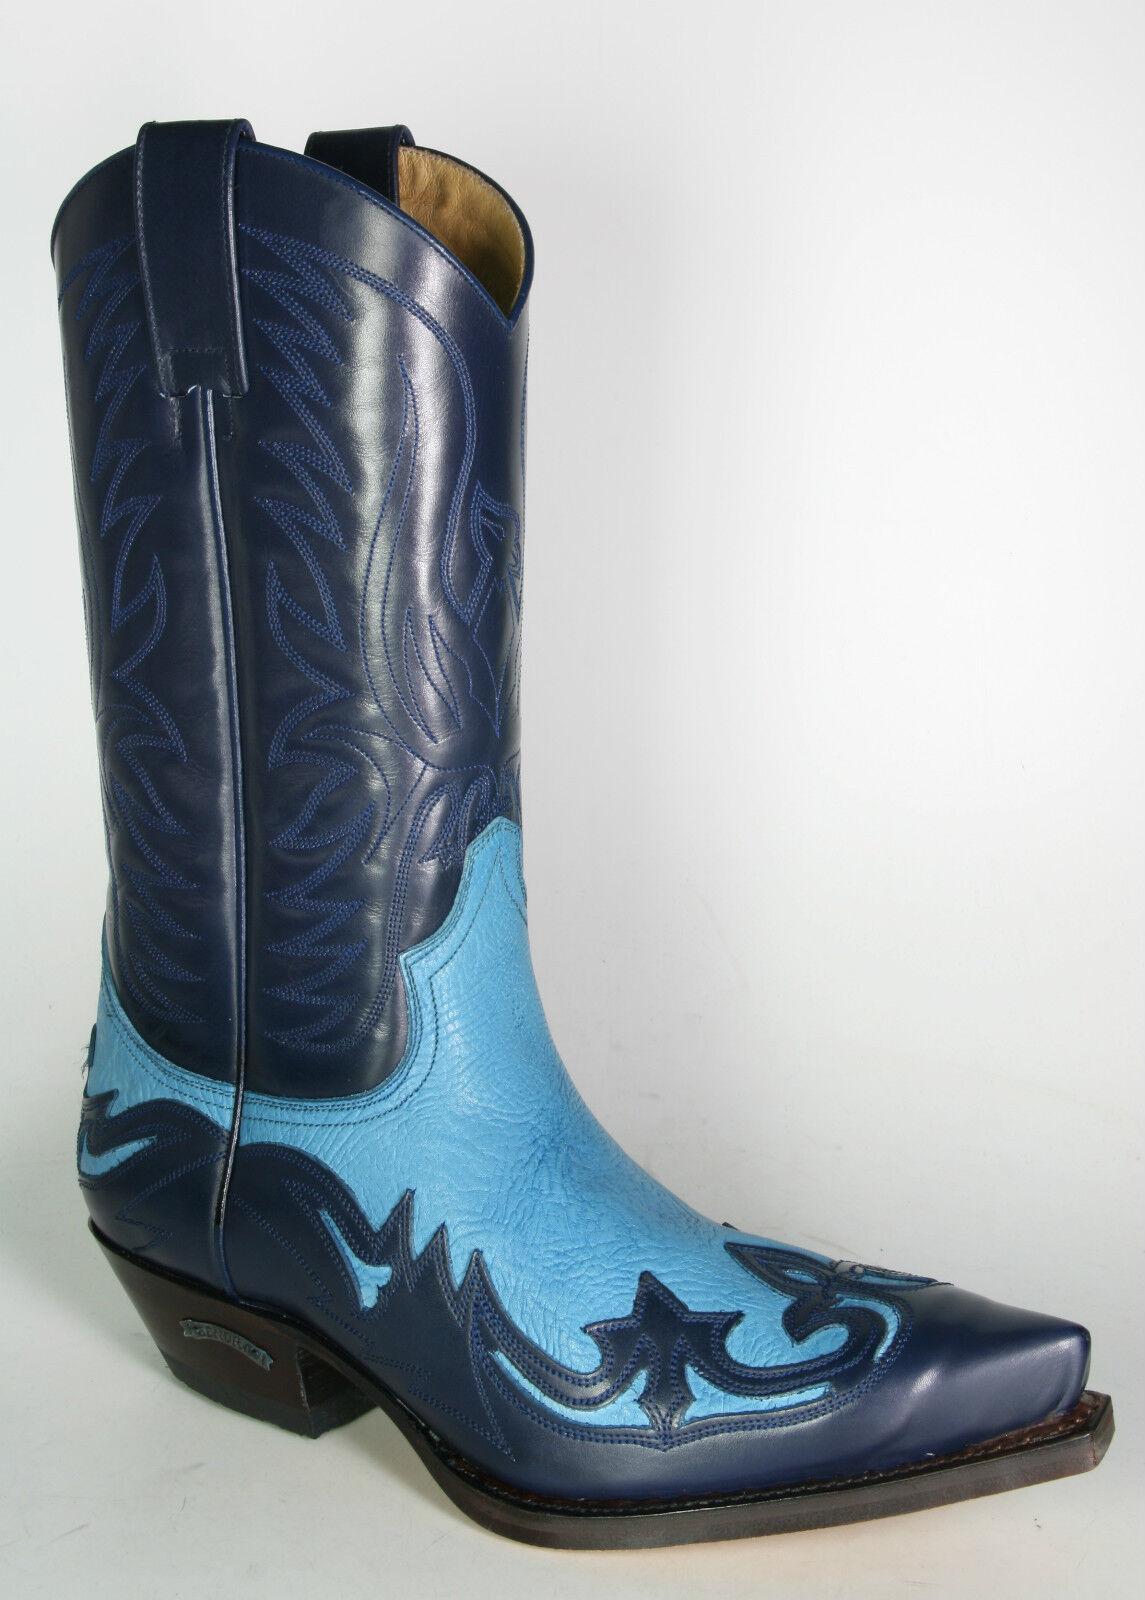 Billig gute Qualität 3241 Sendra Cowboystiefel Marino Azul